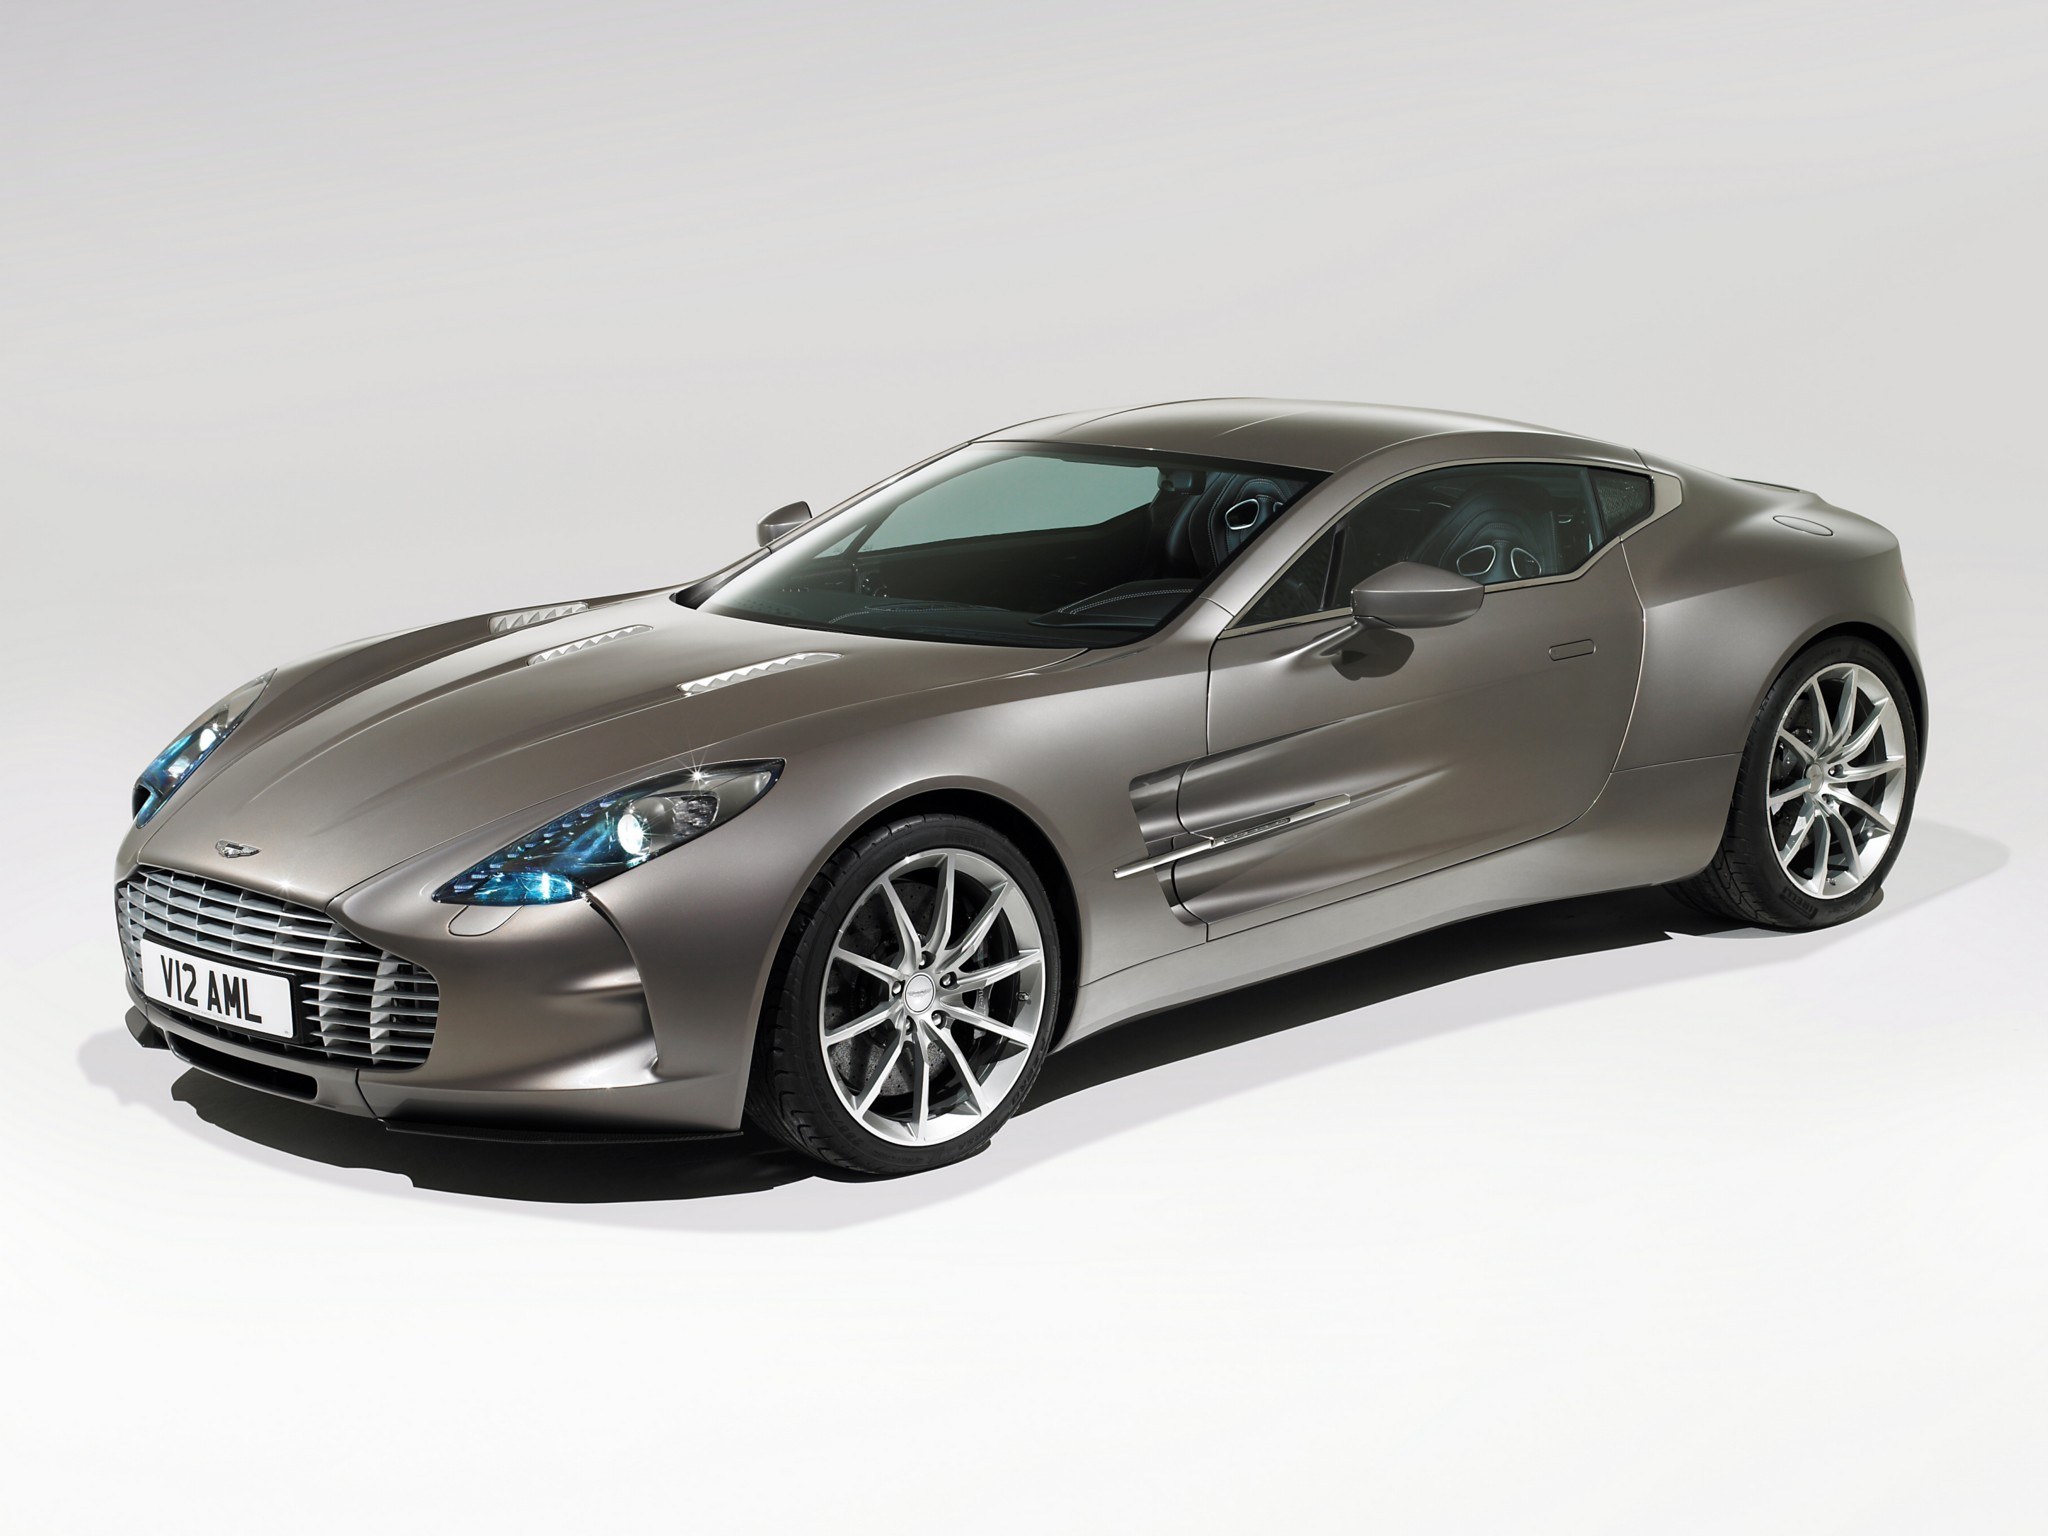 Aston Martin V12 Zagato >> ASTON MARTIN One-77 specs & photos - 2009, 2010, 2011 ...